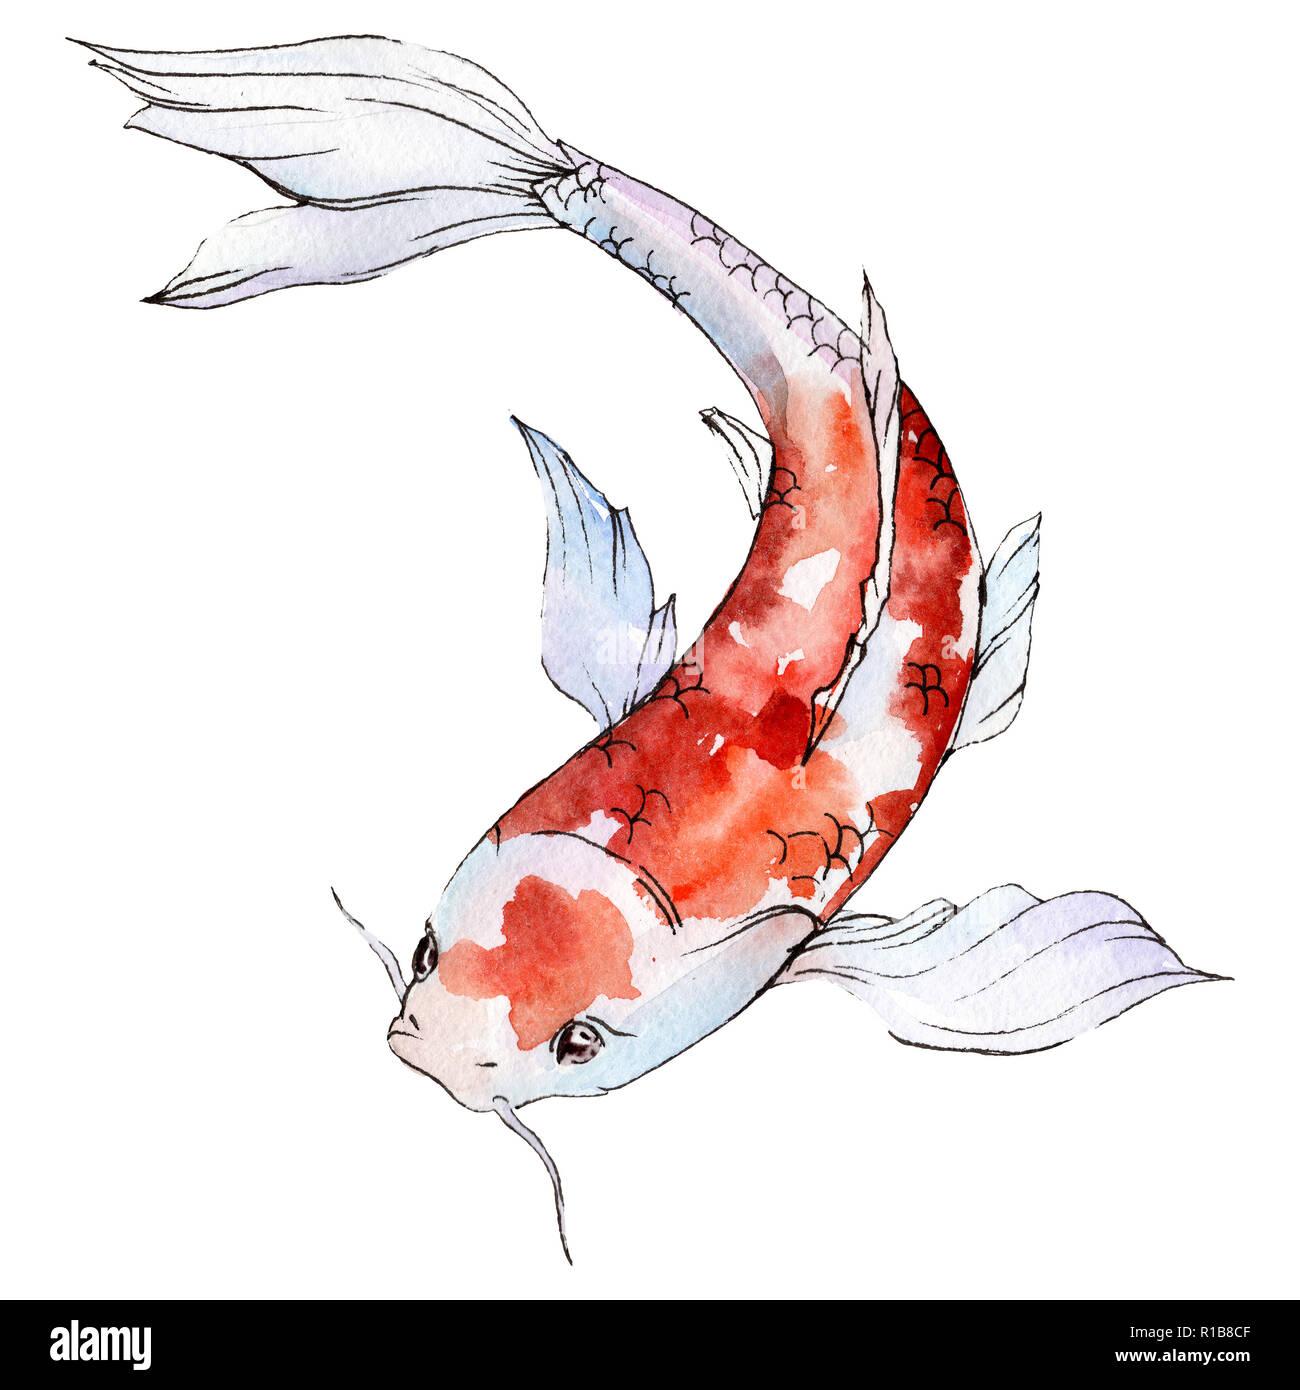 hight resolution of goldfish ilustraci n elemento aislado conjunto de acuarela aquarelle elementos de fondo textura patr n de envoltura